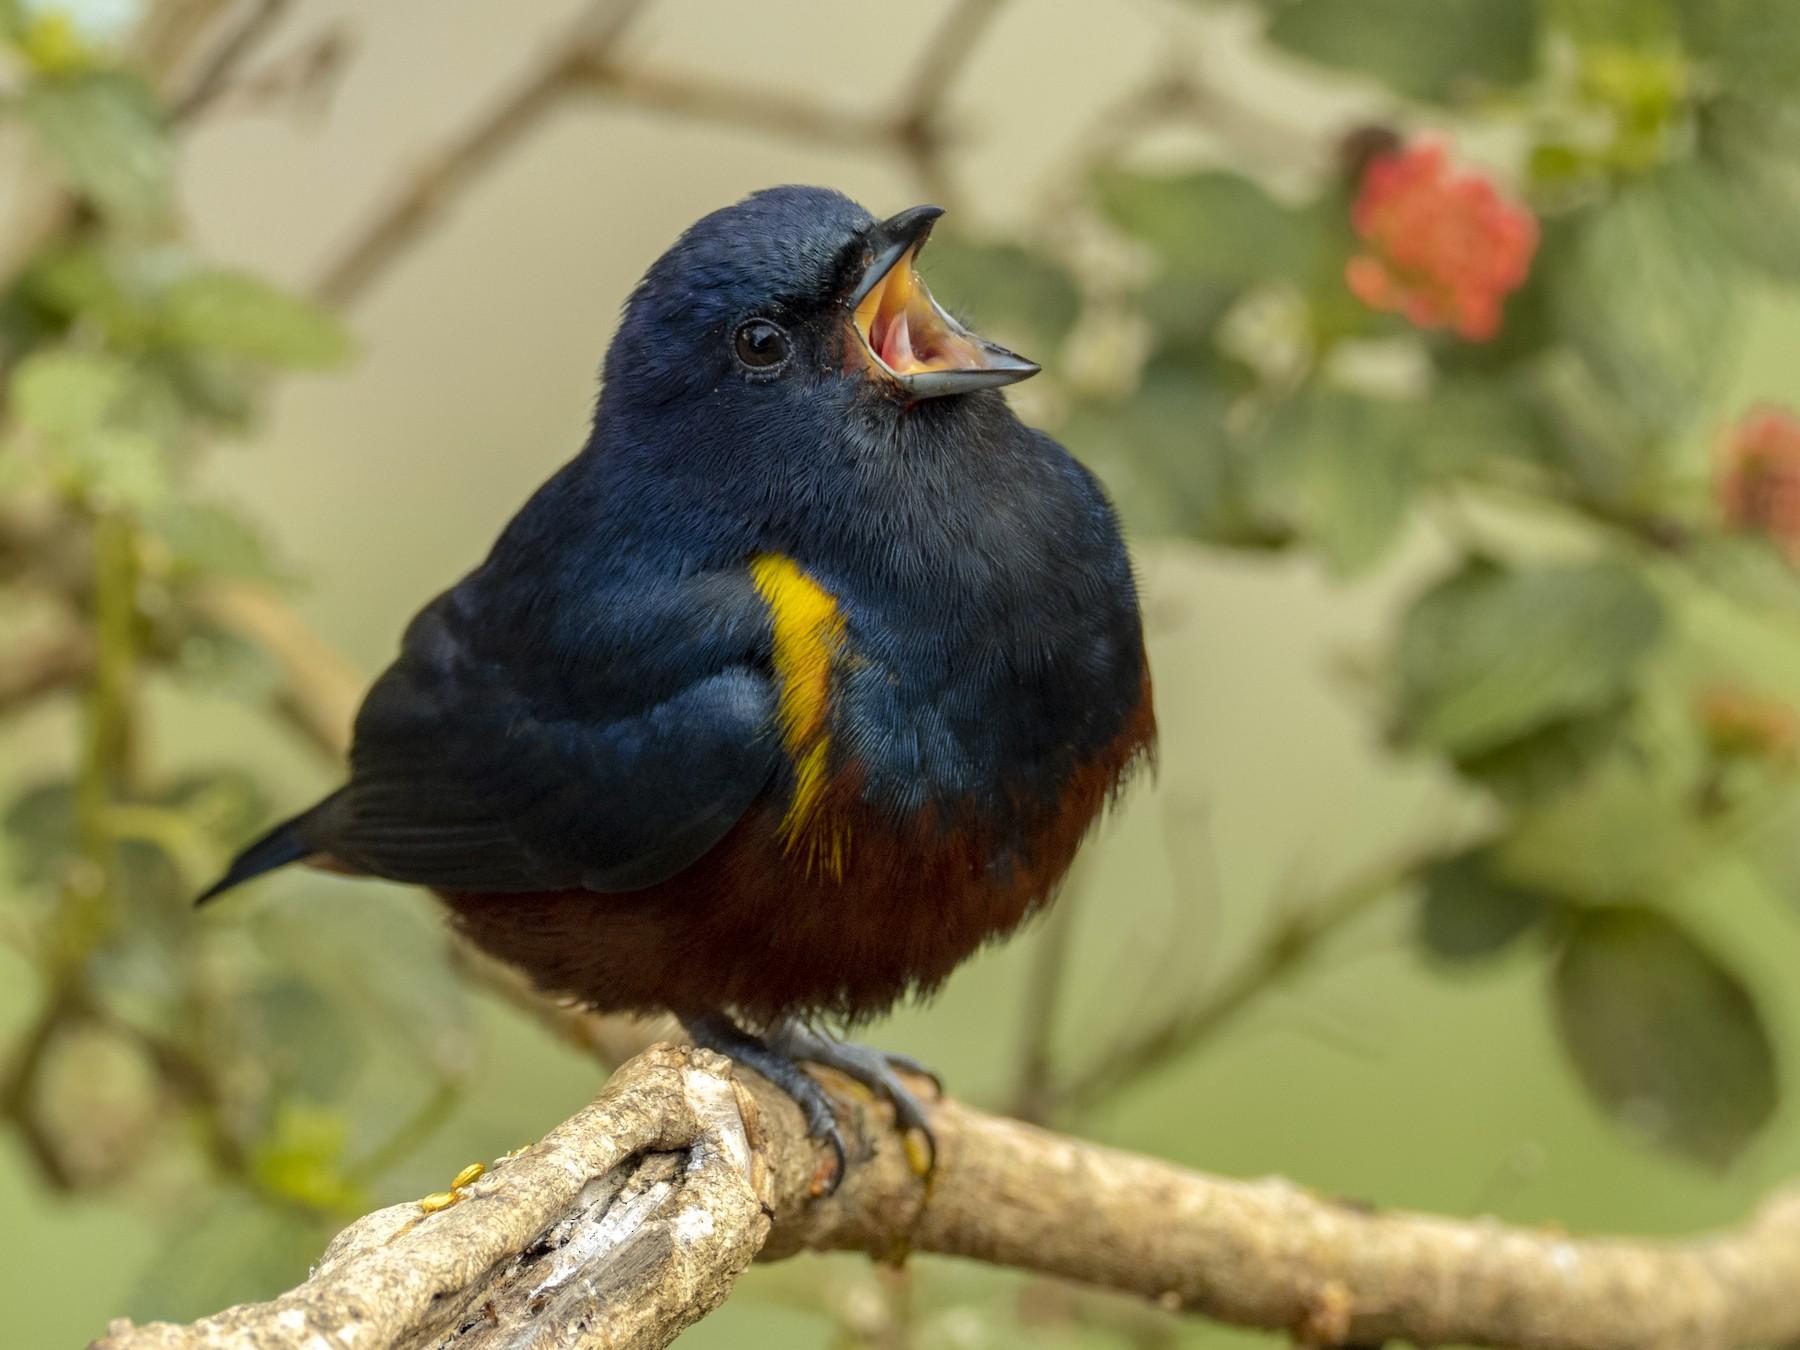 Chestnut-bellied Euphonia - Andres Vasquez Noboa - Tropical Birding Tours